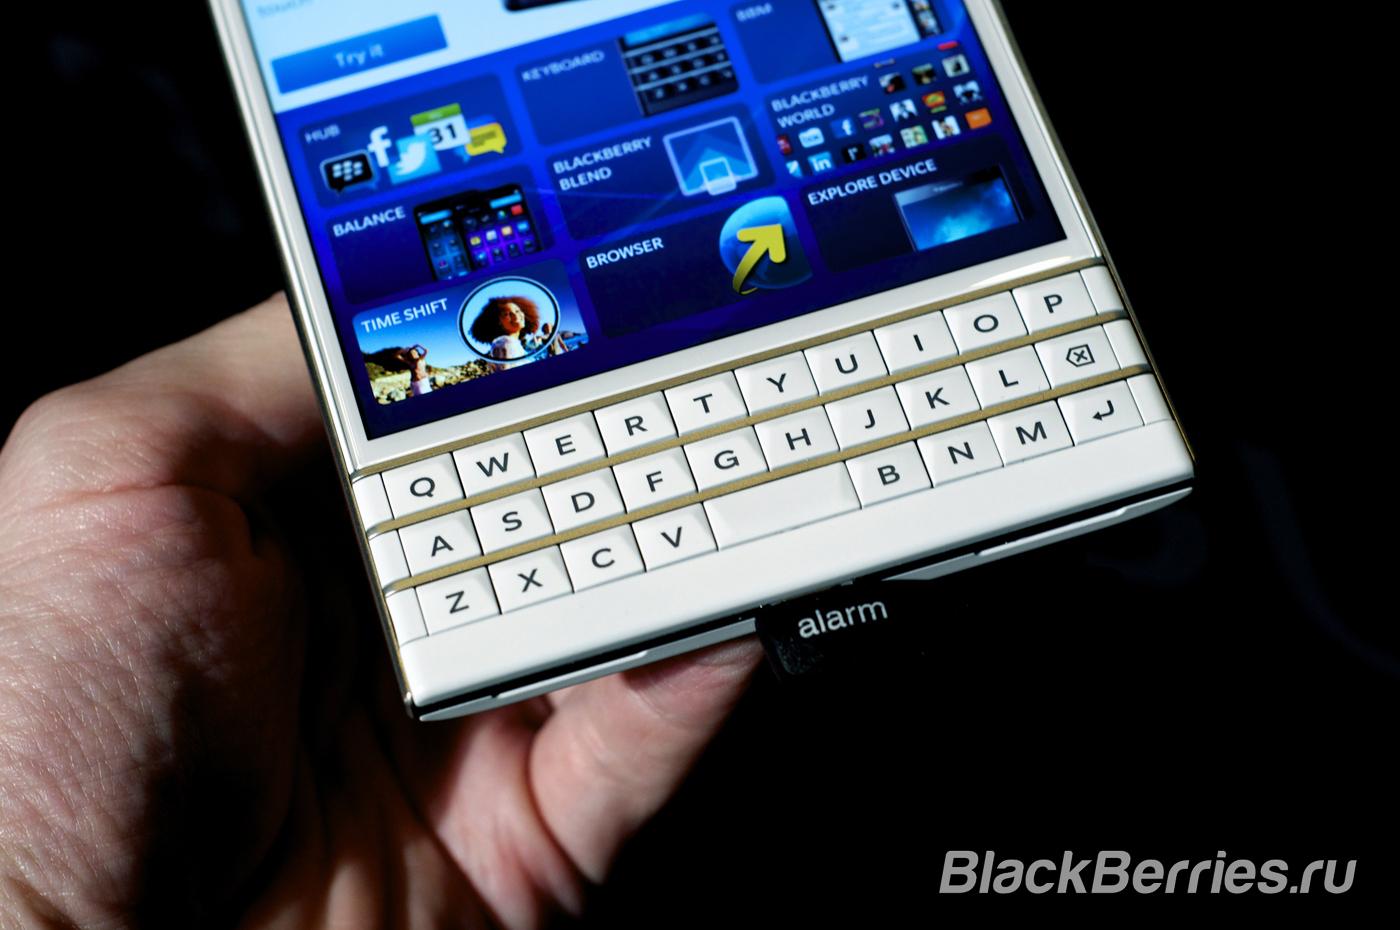 BlackBerry-Passport-Event-069.jpg